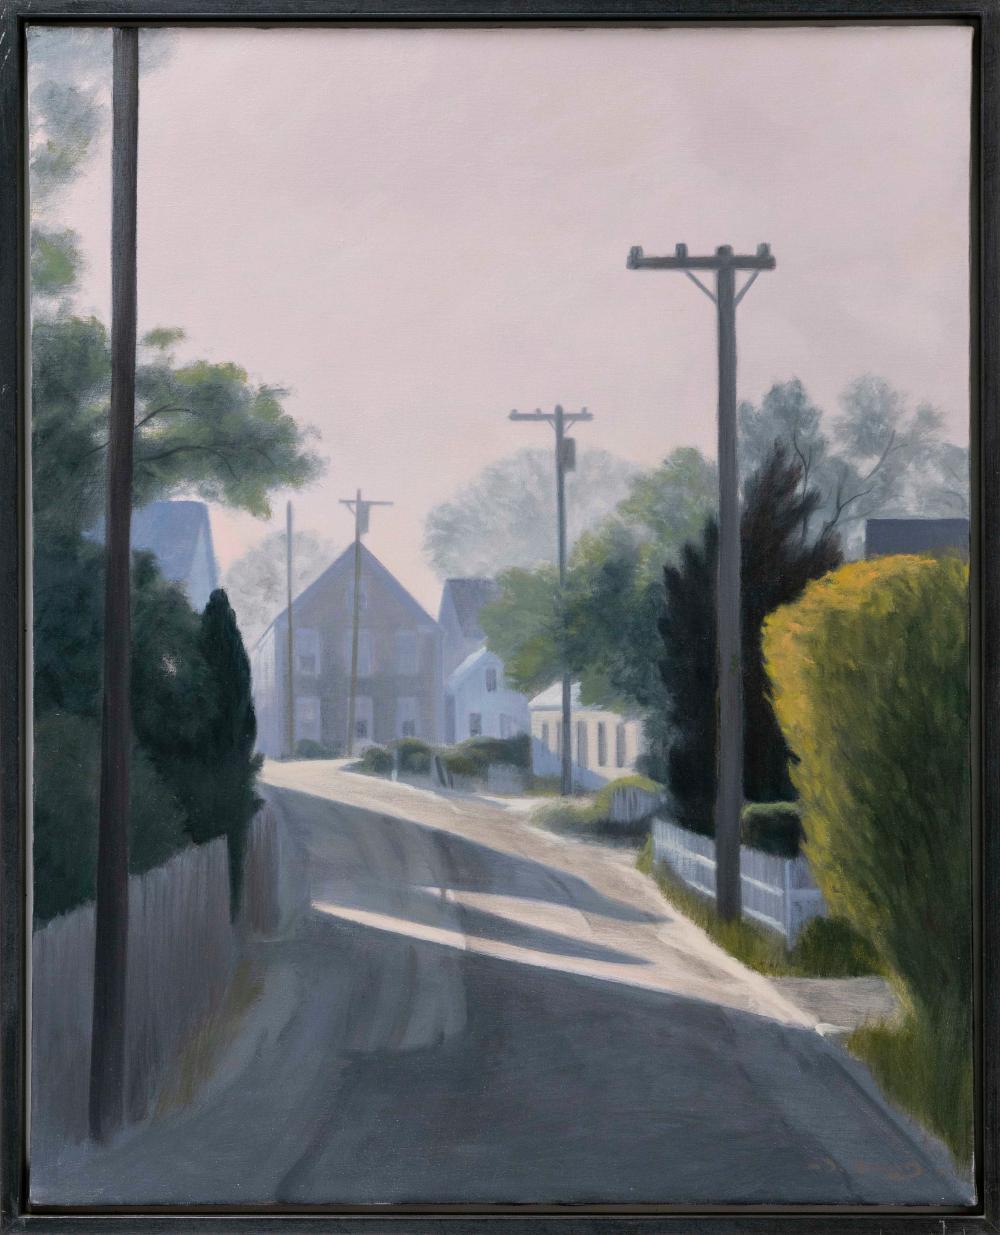 "JOHN DOWD, Massachusetts, b. 1960, Shadows on Commerical Street, Provincetown., Oil on canvas, 30"" x 24"". Framed 31.5"" x 25.5""."